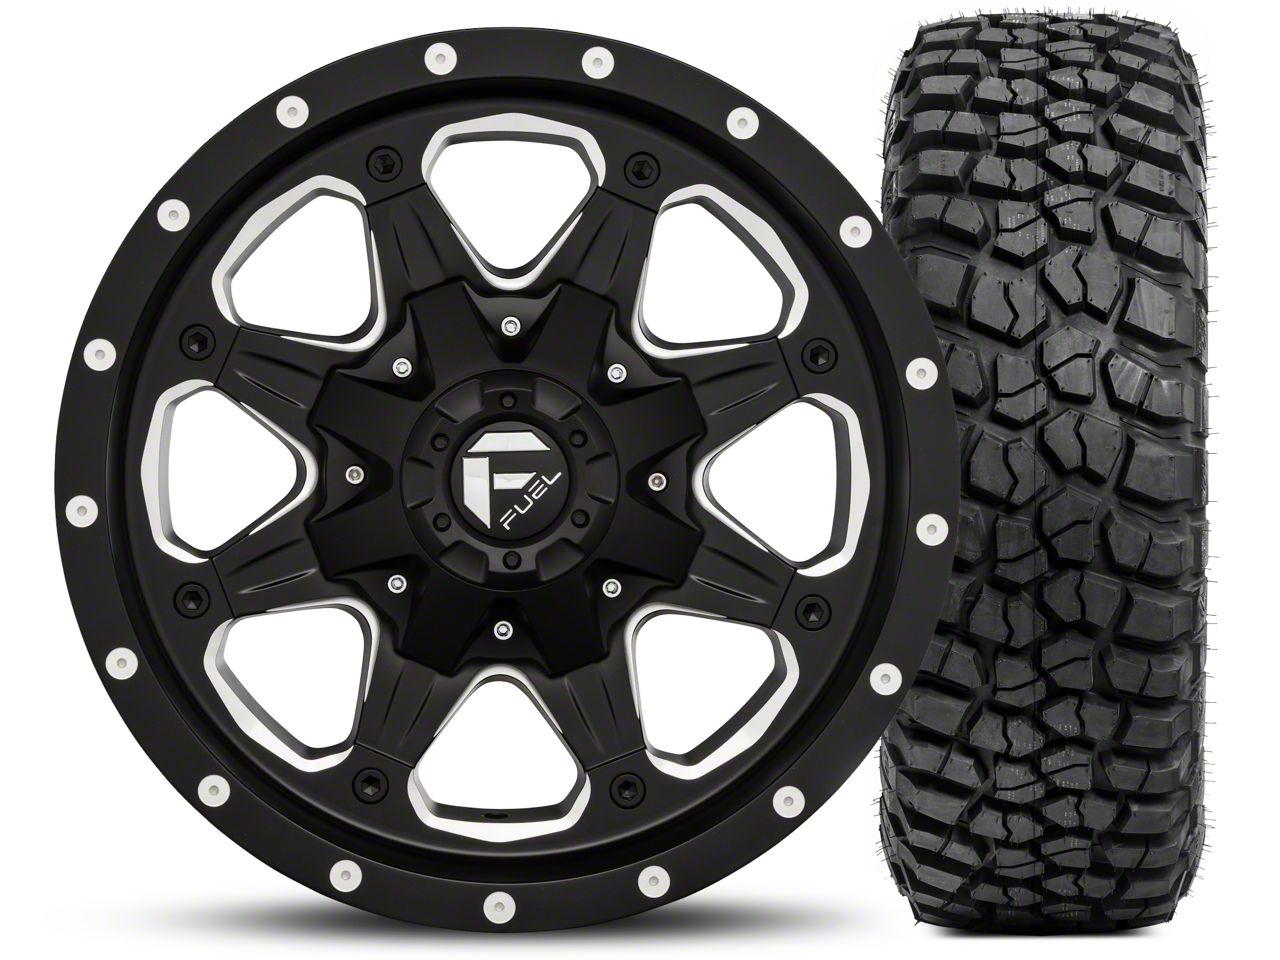 Fuel Wheels Boost Black/Milled 16x8 Wheel - and BF Goodrich Mud Terrain T/A KM2 265/75R16 Kit (07-18 Wrangler JK)